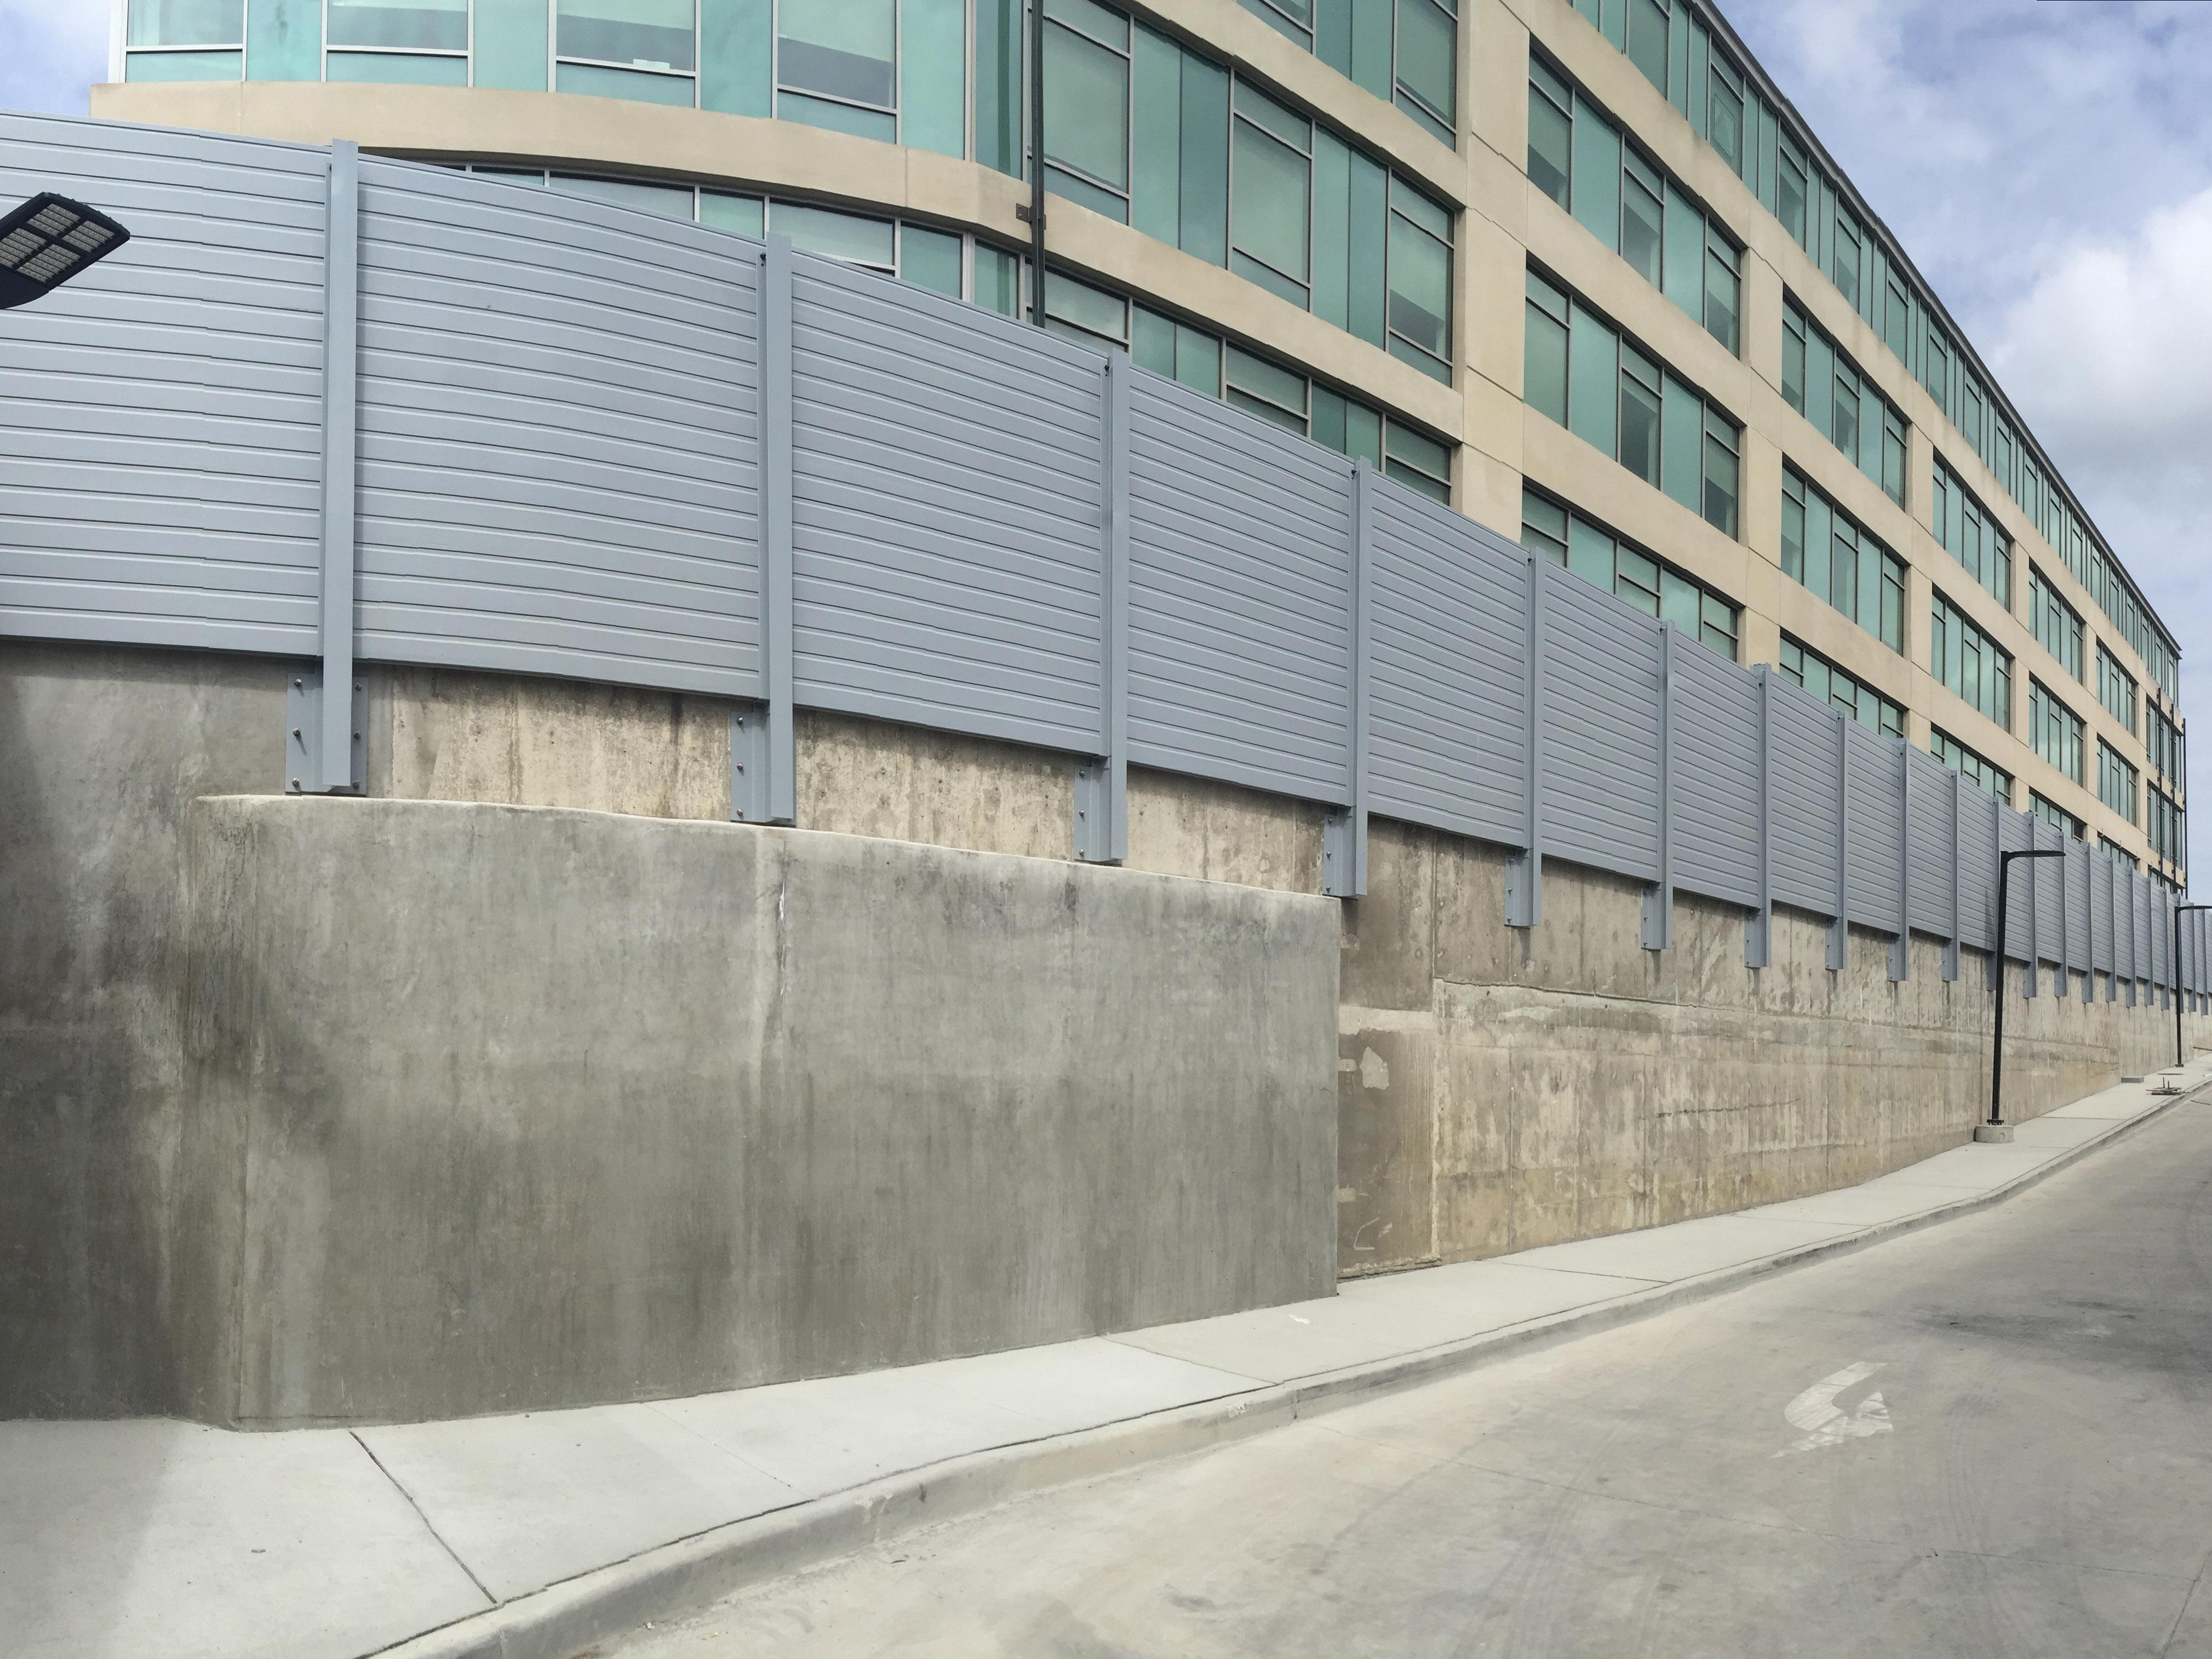 sound barrier walls. G R P Sound Barrier Wall. F Soundwall. GRP Soundscape Soundwall Walls